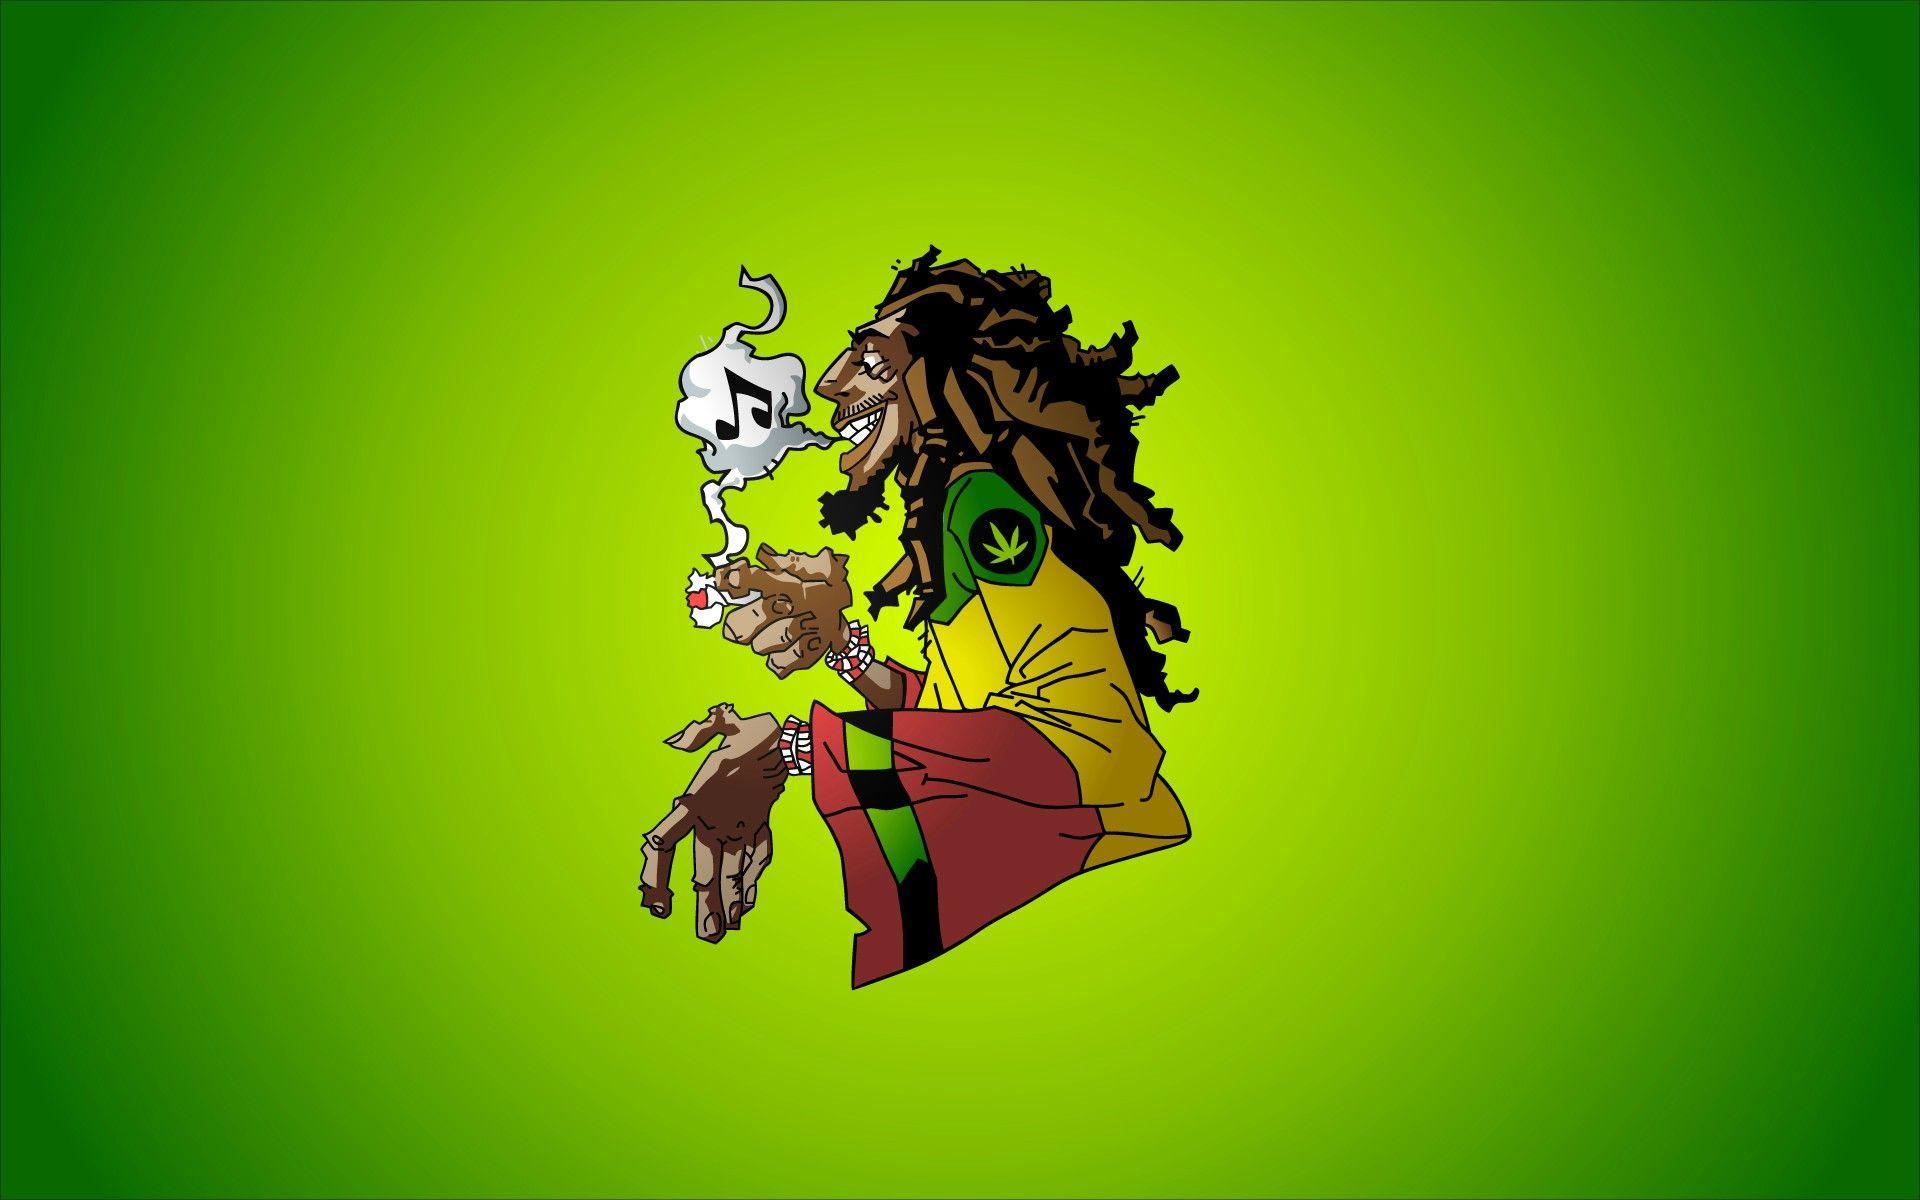 Cartoon Weed Wallpapers Top Free Cartoon Weed Backgrounds Wallpaperaccess